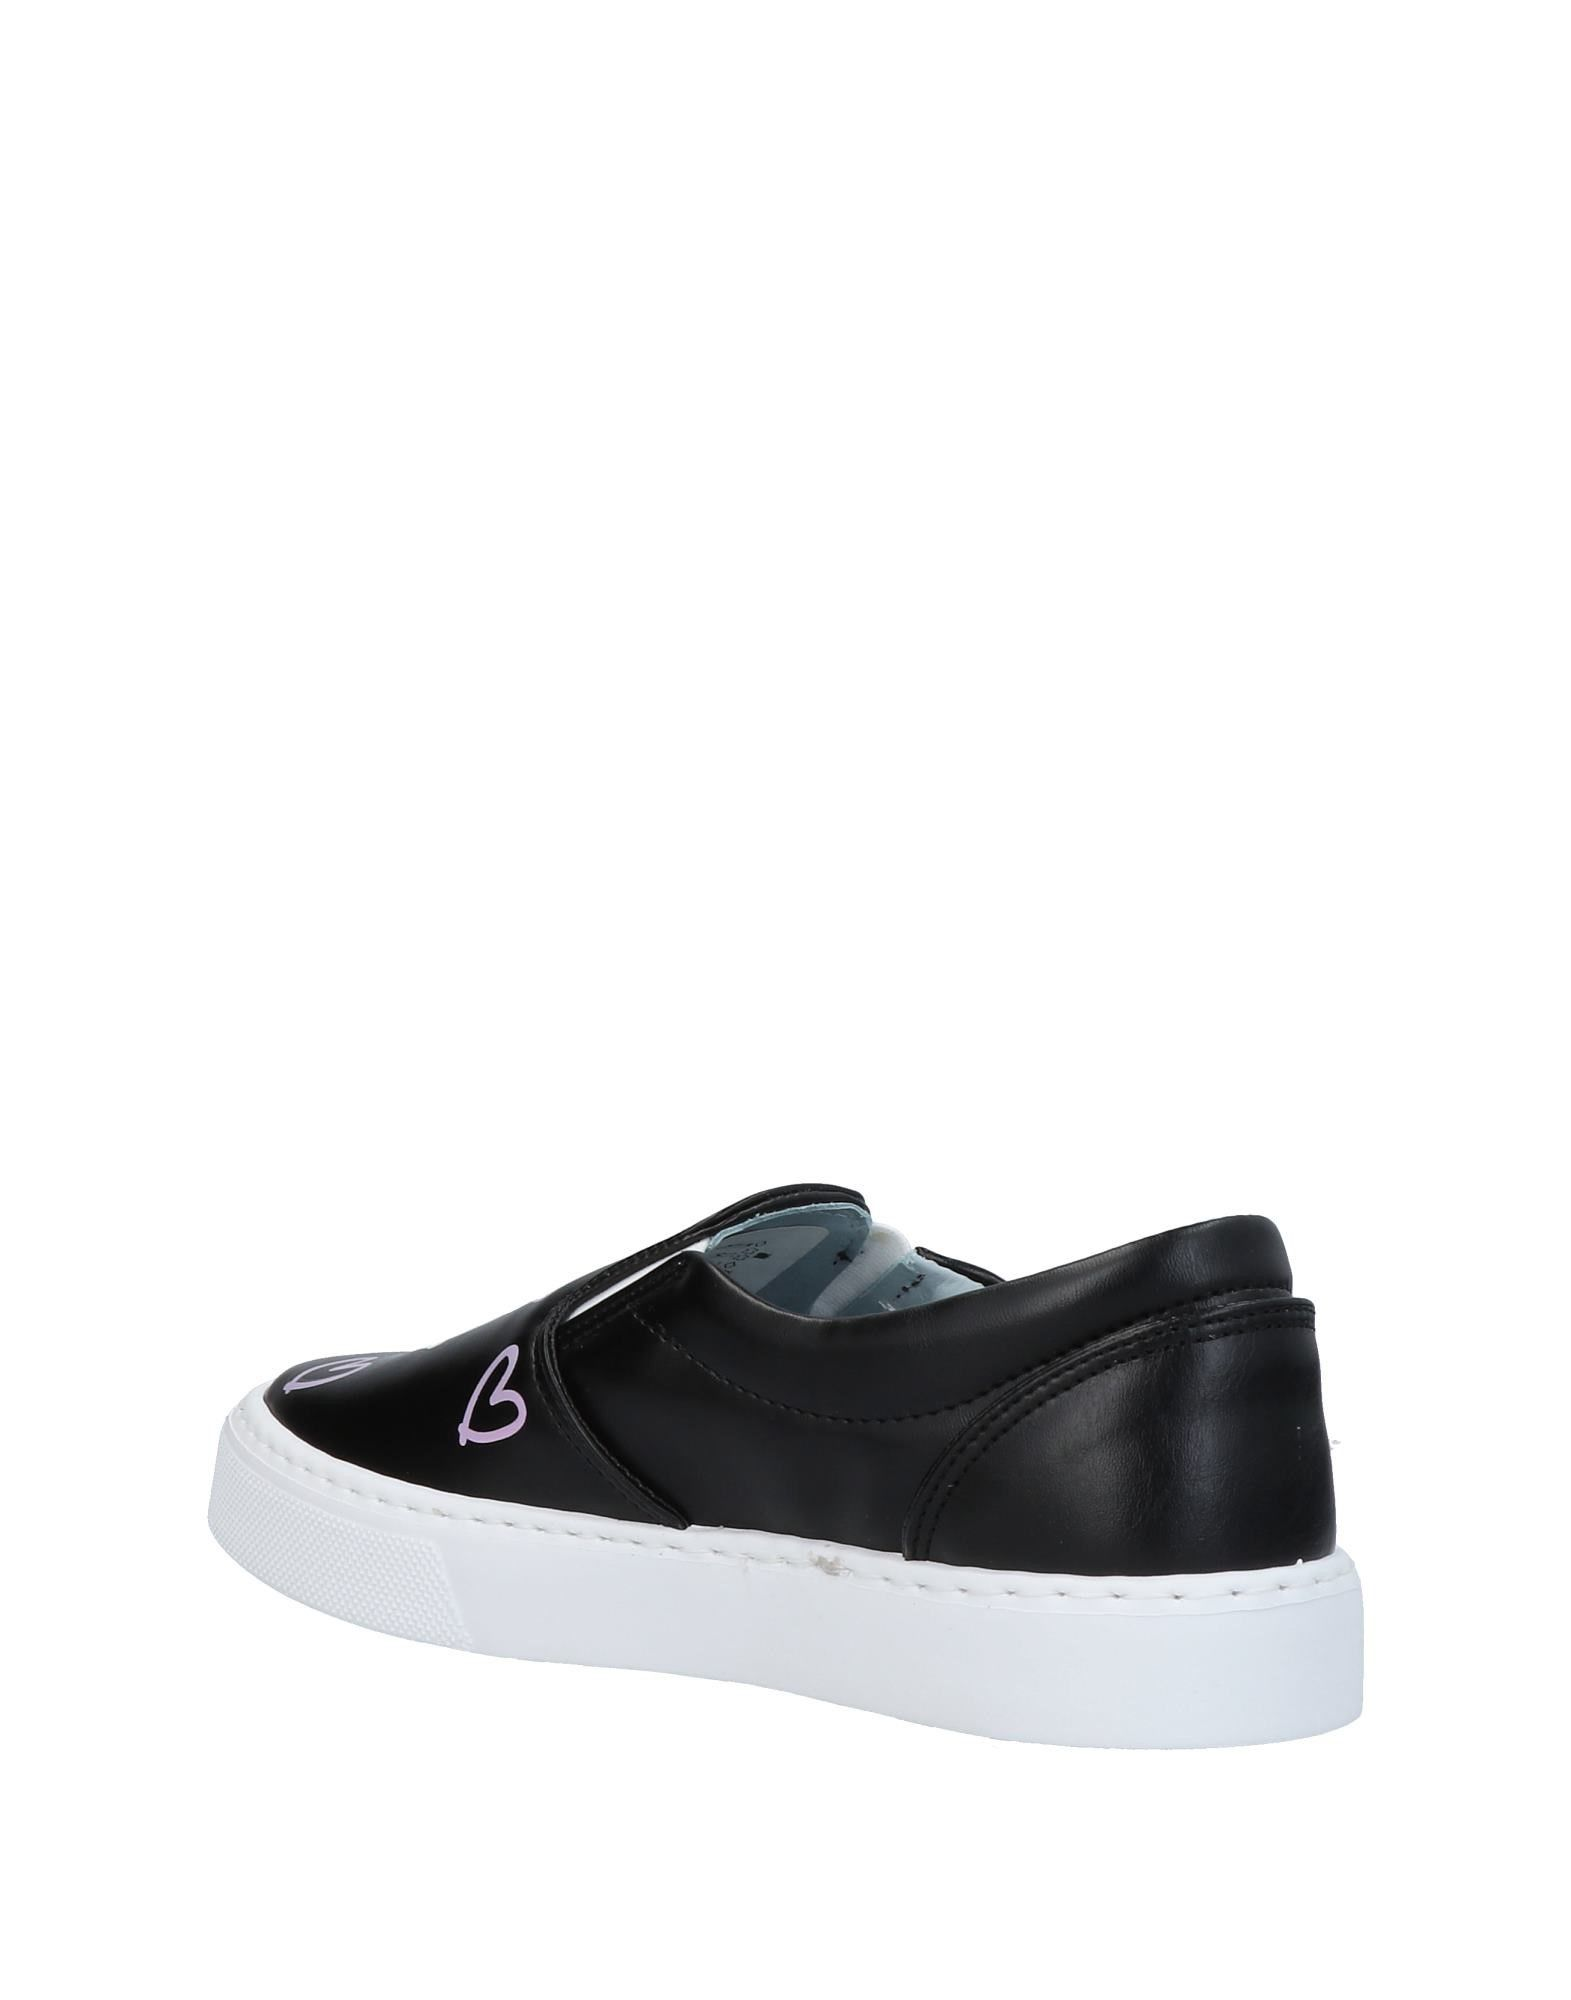 Stilvolle Sneakers billige Schuhe Chiara Ferragni Sneakers Stilvolle Damen  11452612GV 2cba29